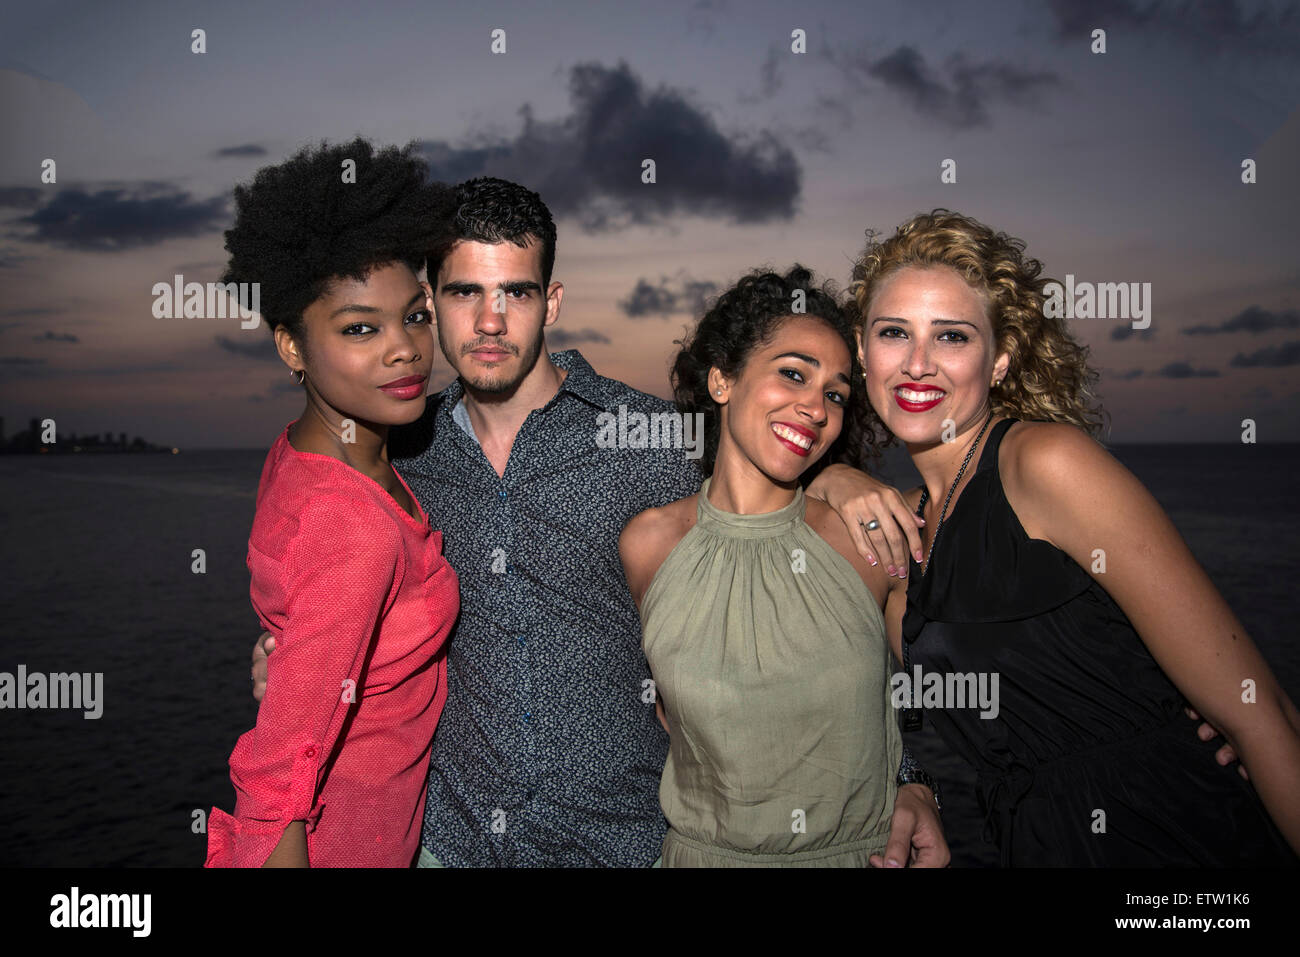 Quattro giovani insieme Immagini Stock